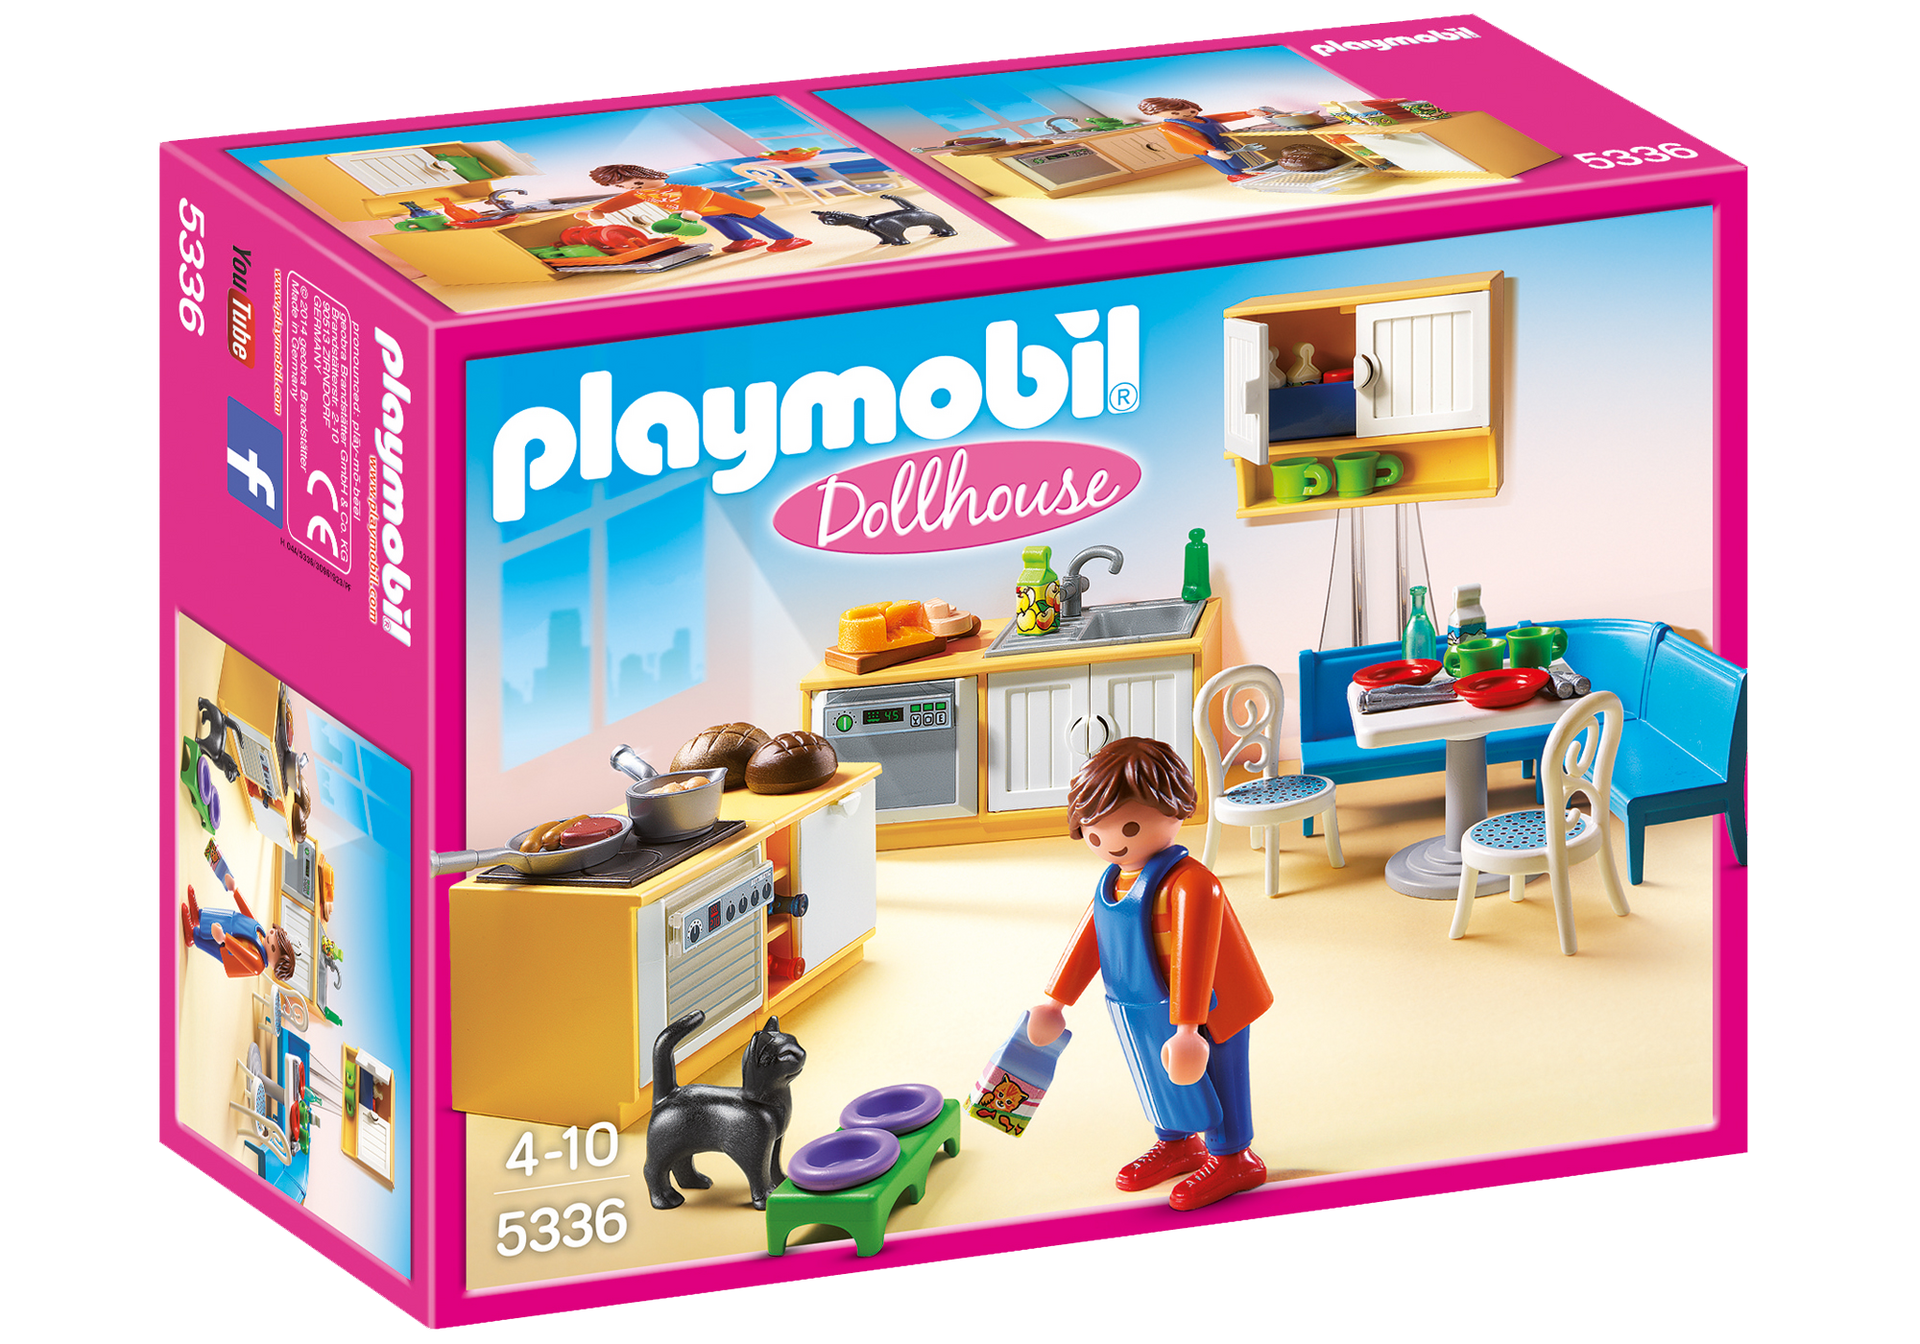 Cuisine avec coin repas 5336 playmobil france for Playmobil cuisine